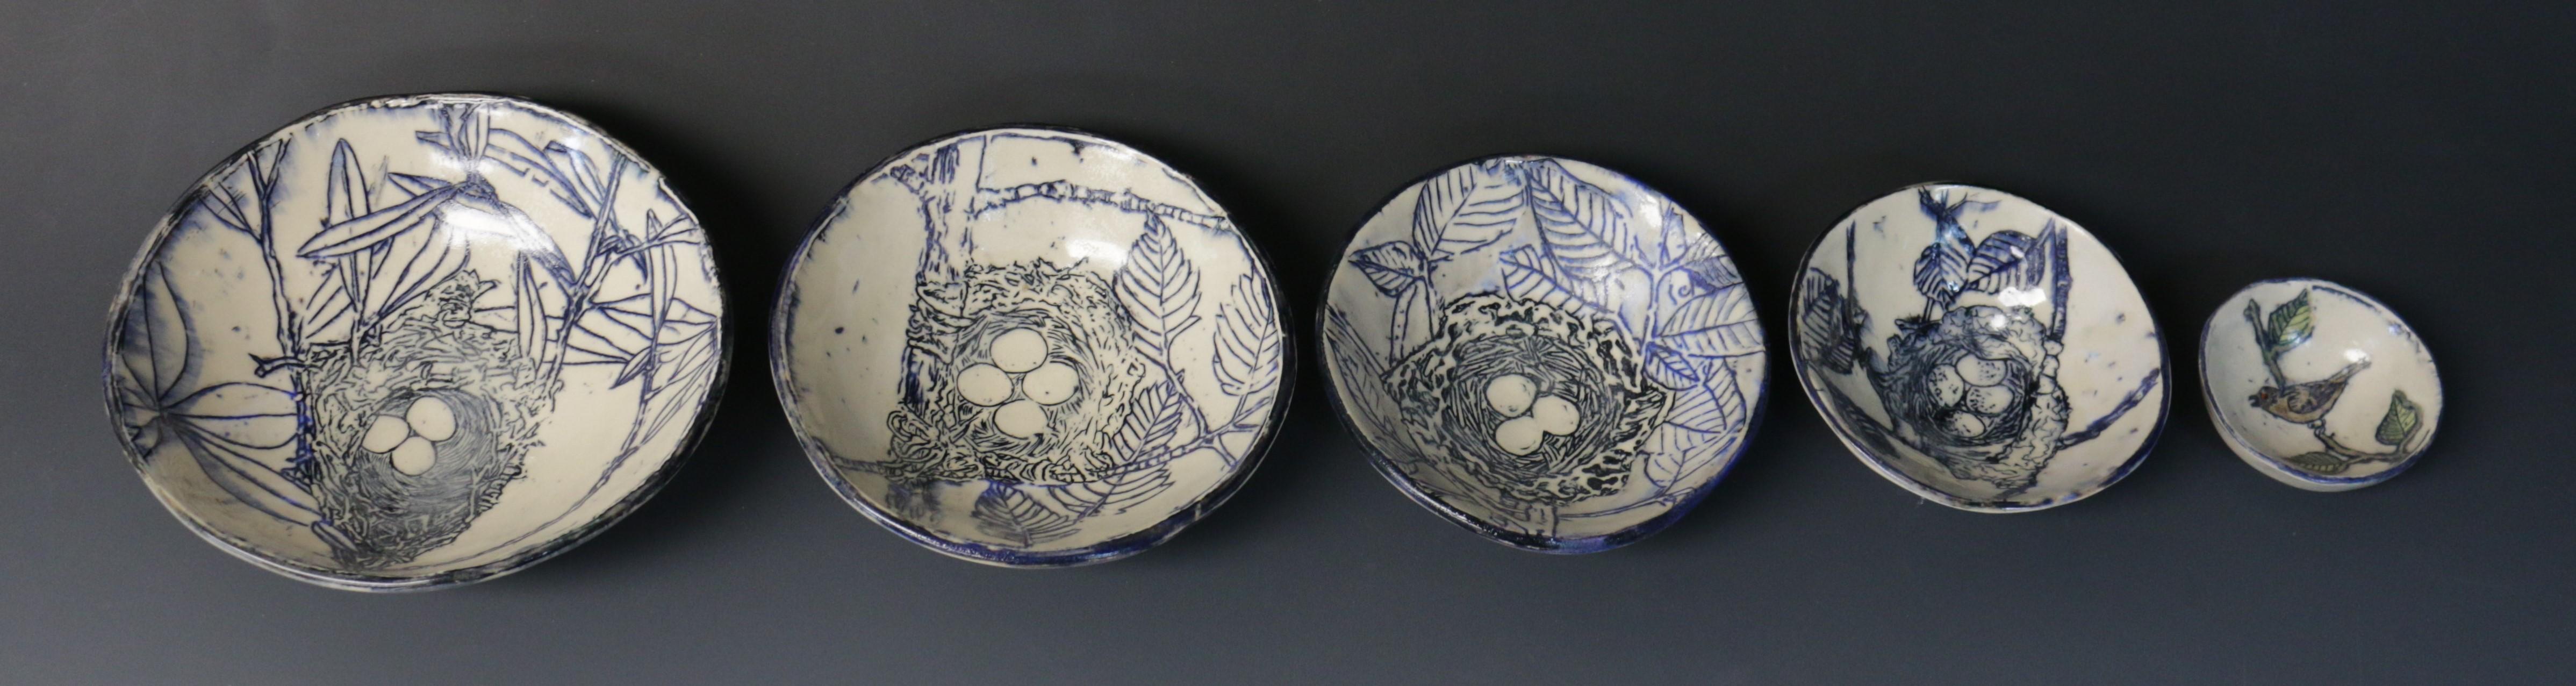 vireo decending bowls small 2